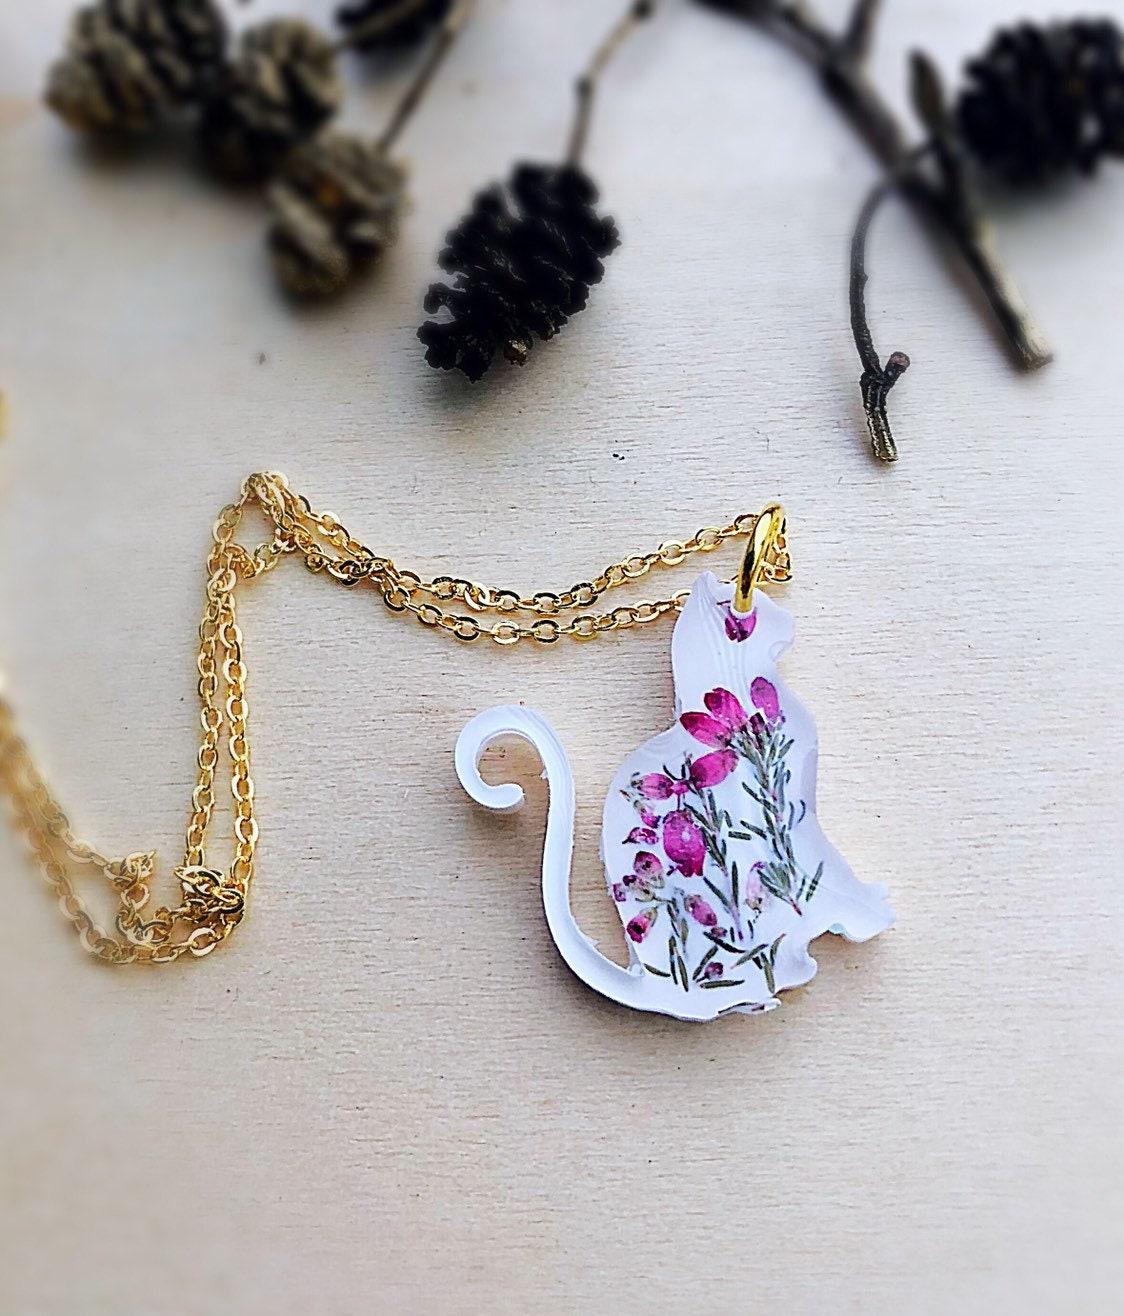 Handmade from resin Royal Kitten Necklace